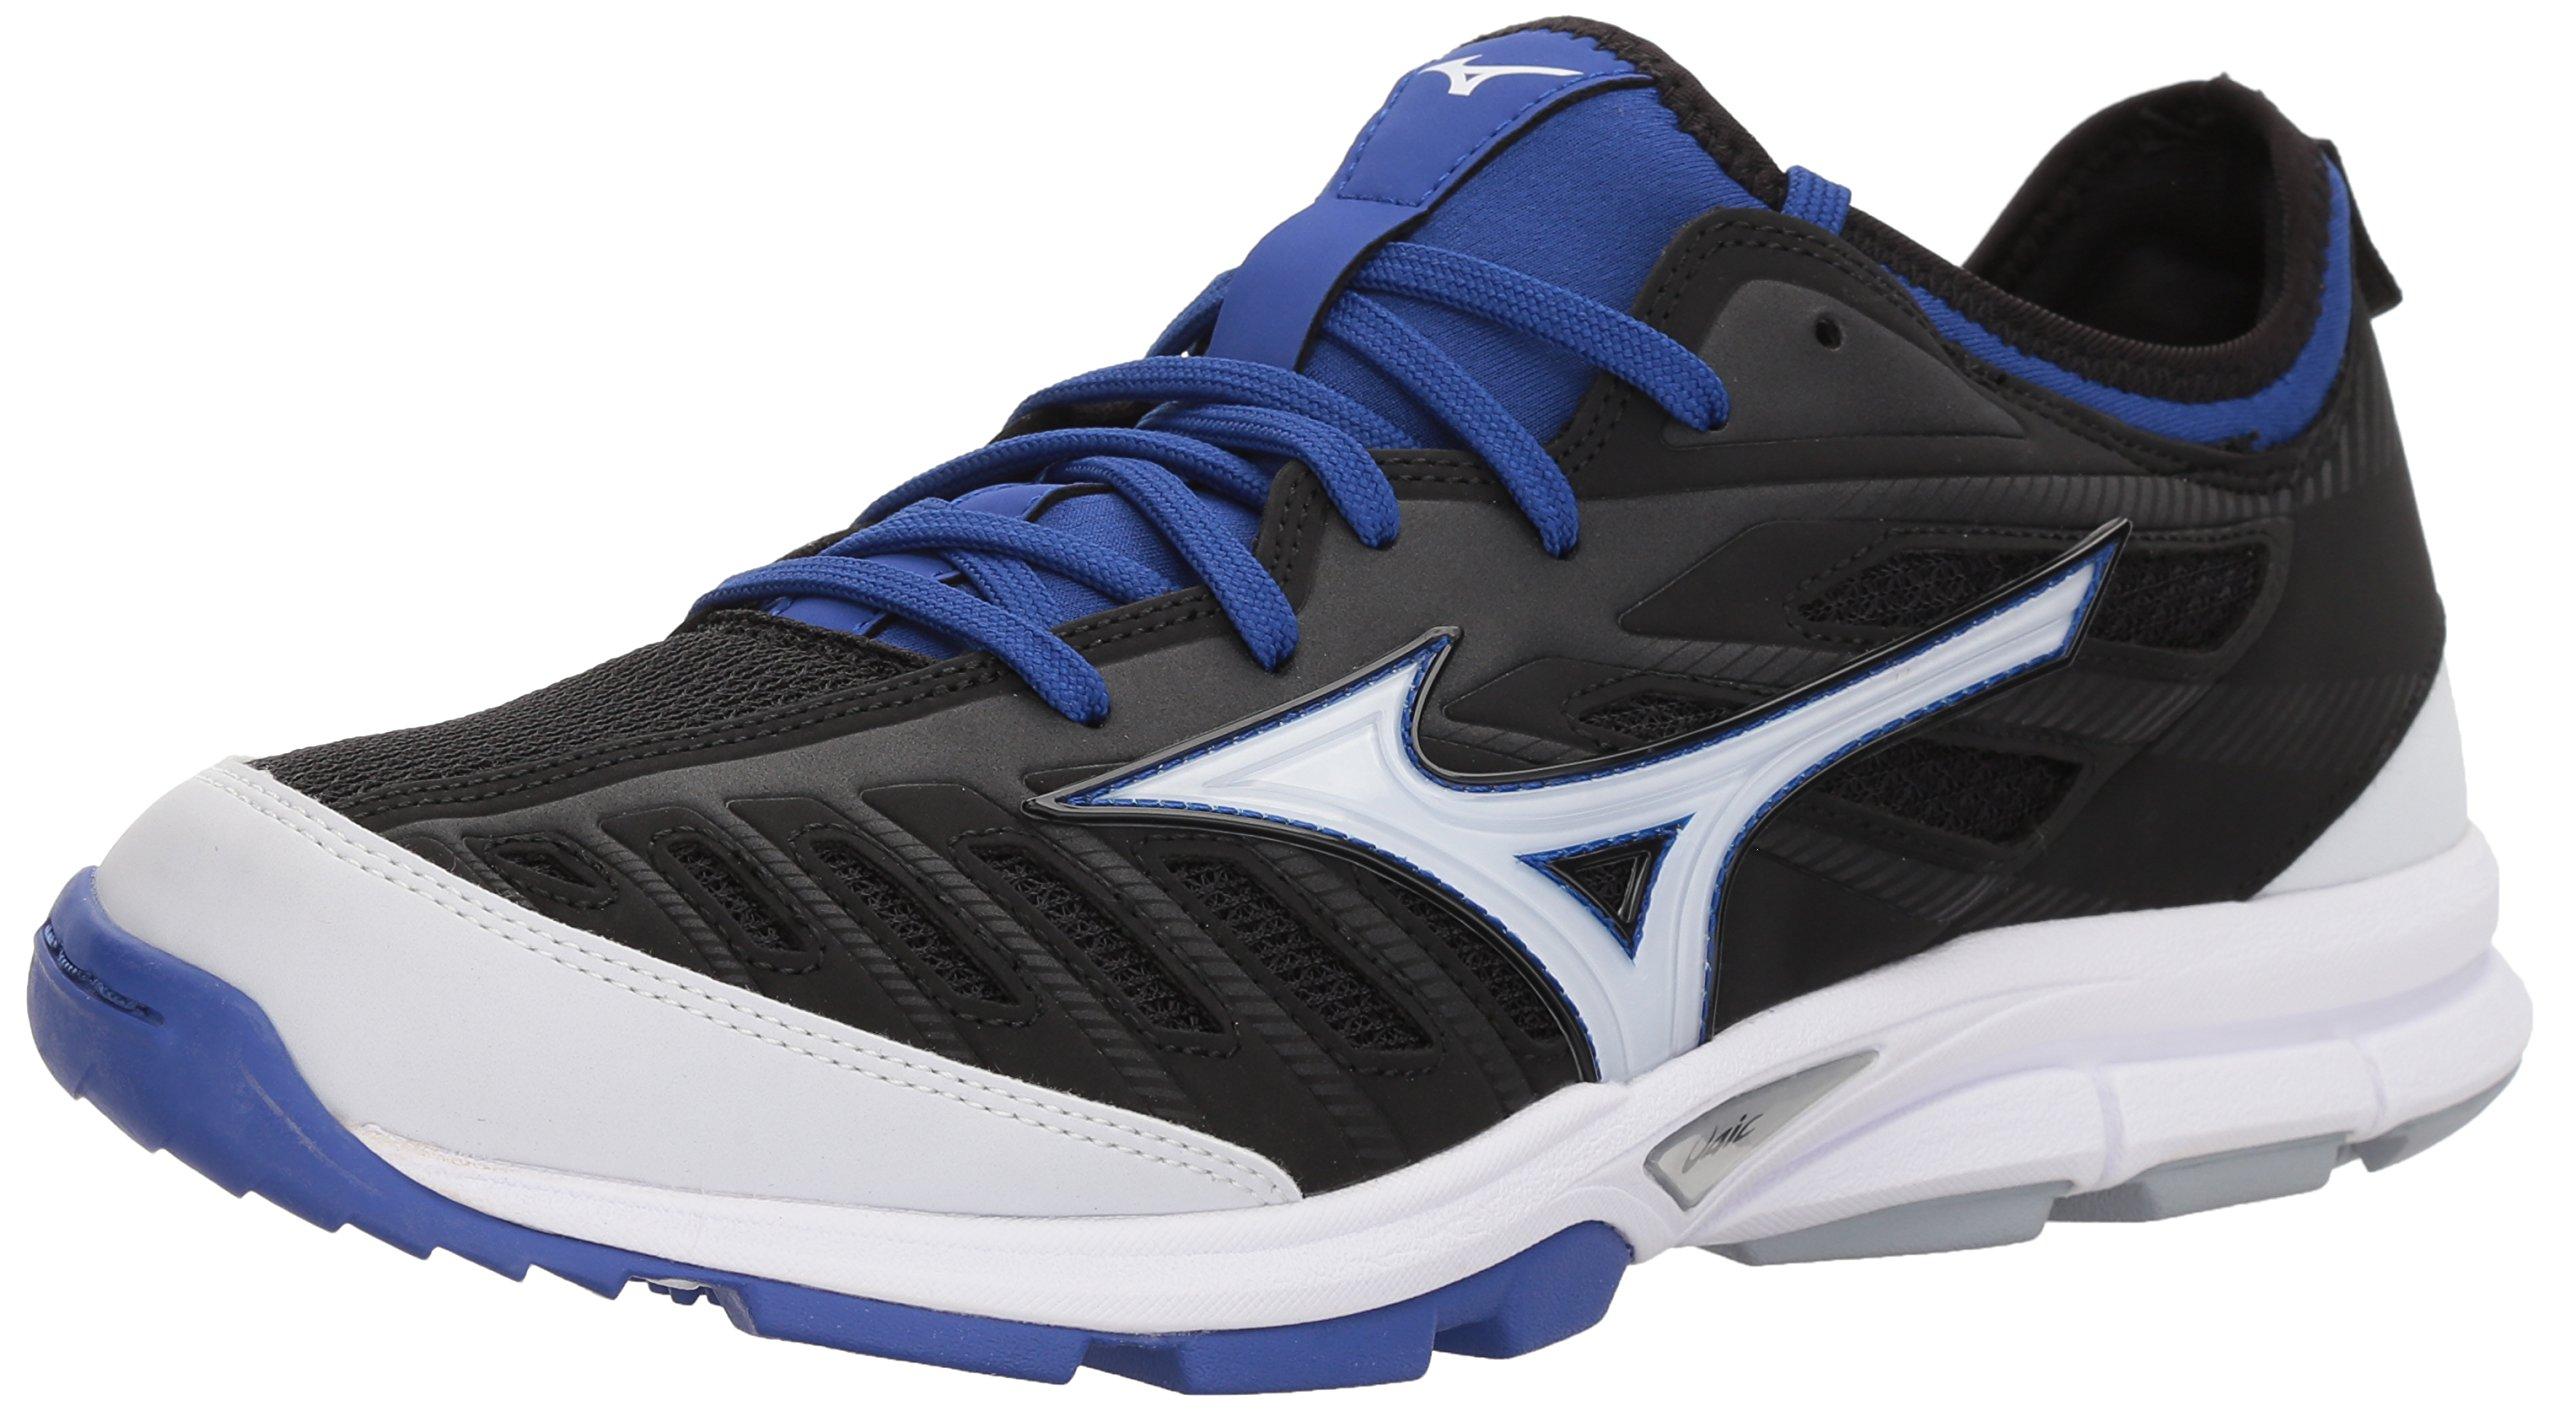 Mizuno Men's Players Trainer 2 Turf Baseball-Shoes,Black/Royal,11 D US by Mizuno